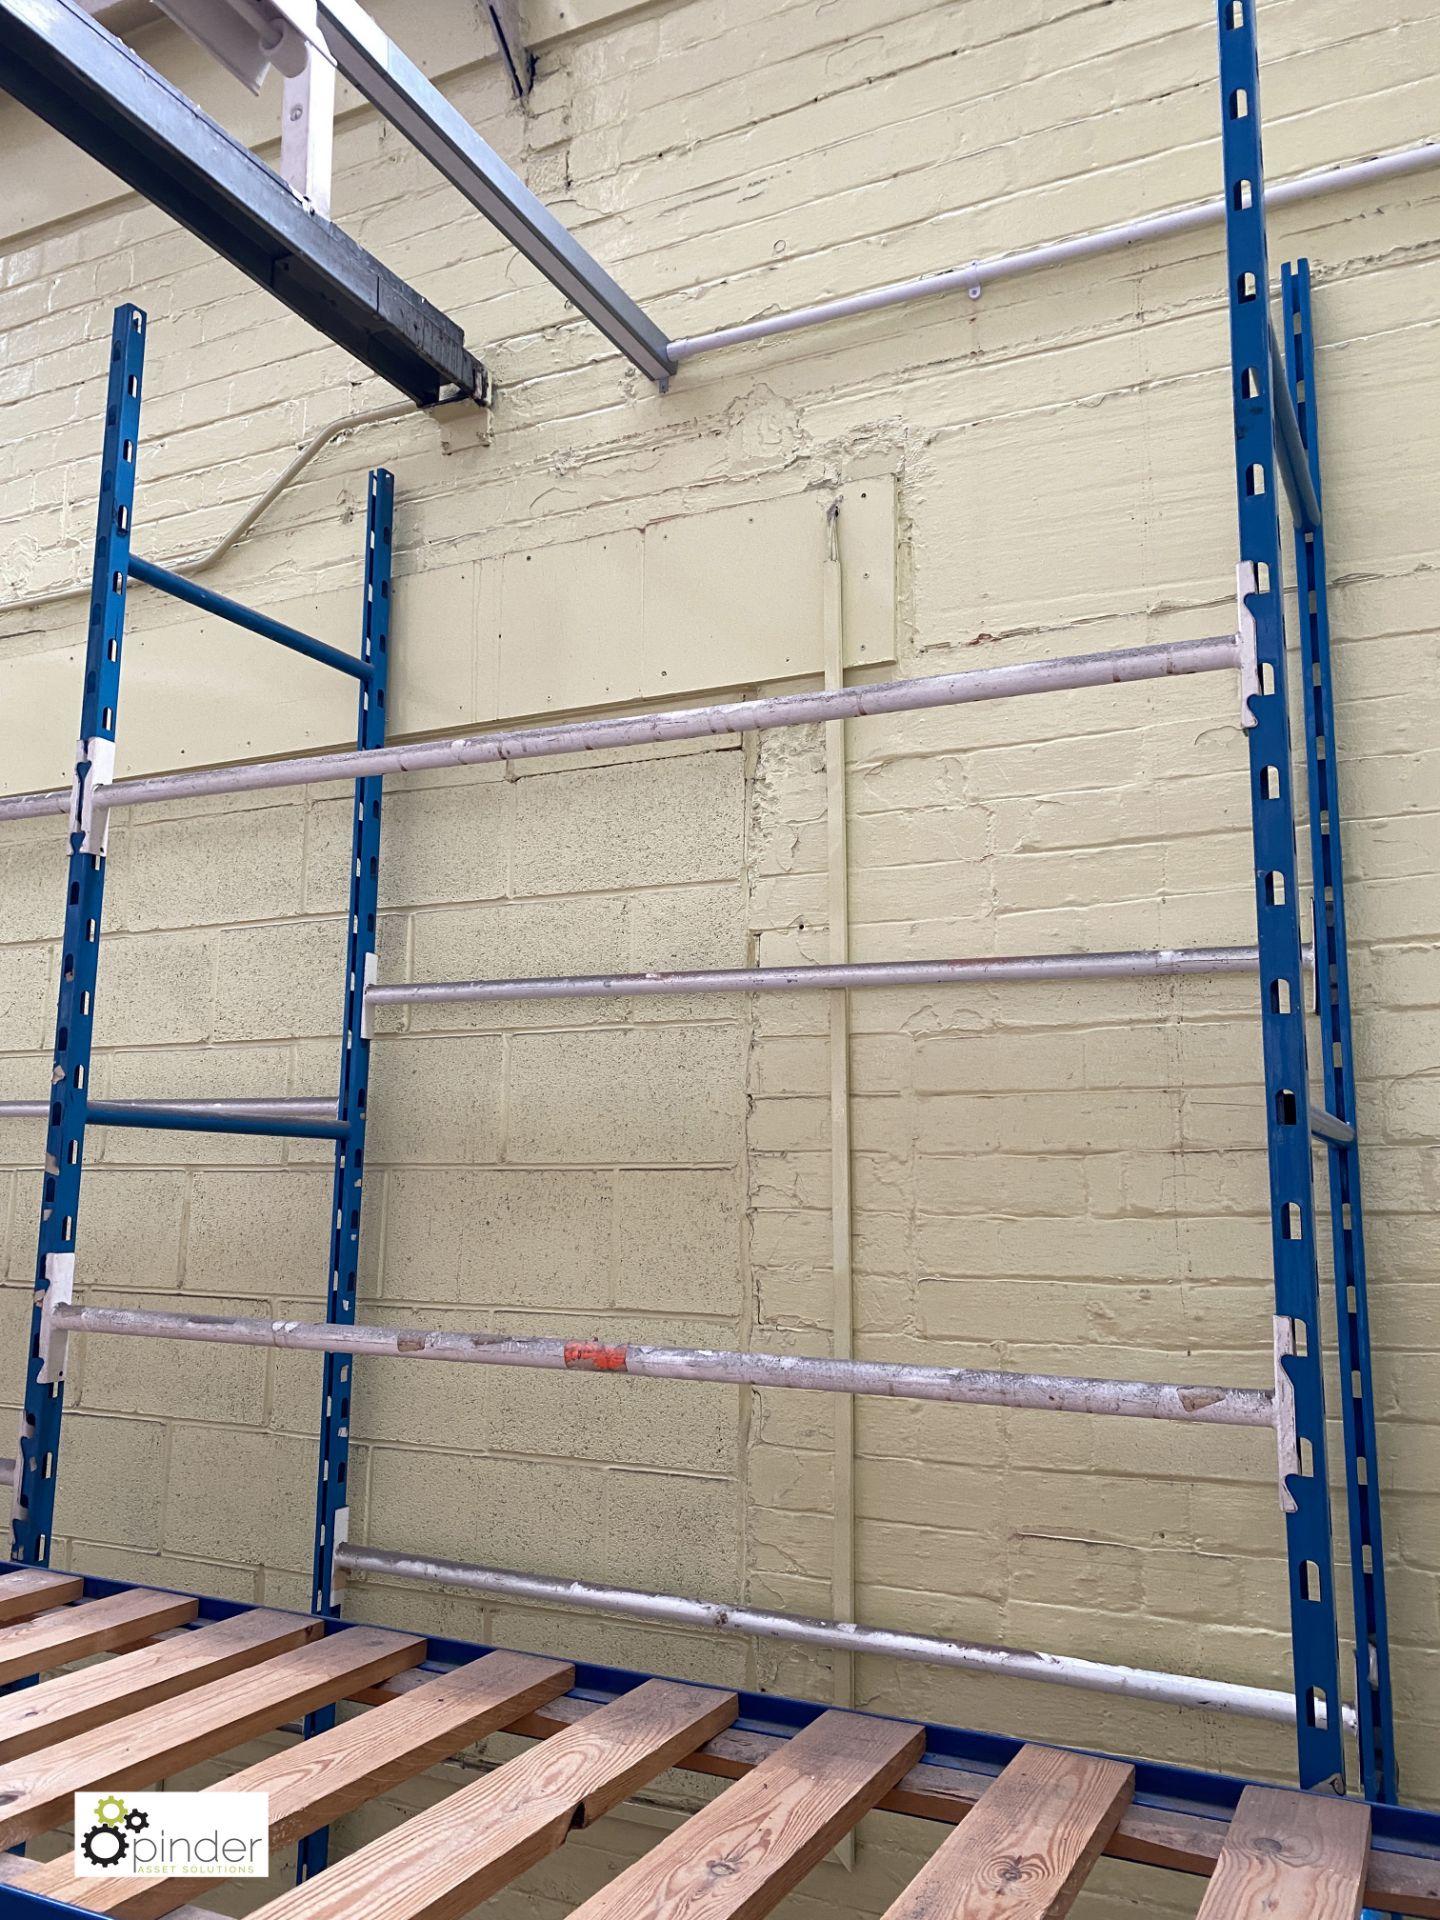 11 bays boltless Garment Hanging Racking, comprising 12 uprights 3050mm x 610mm, 55 tubular rails - Image 4 of 4